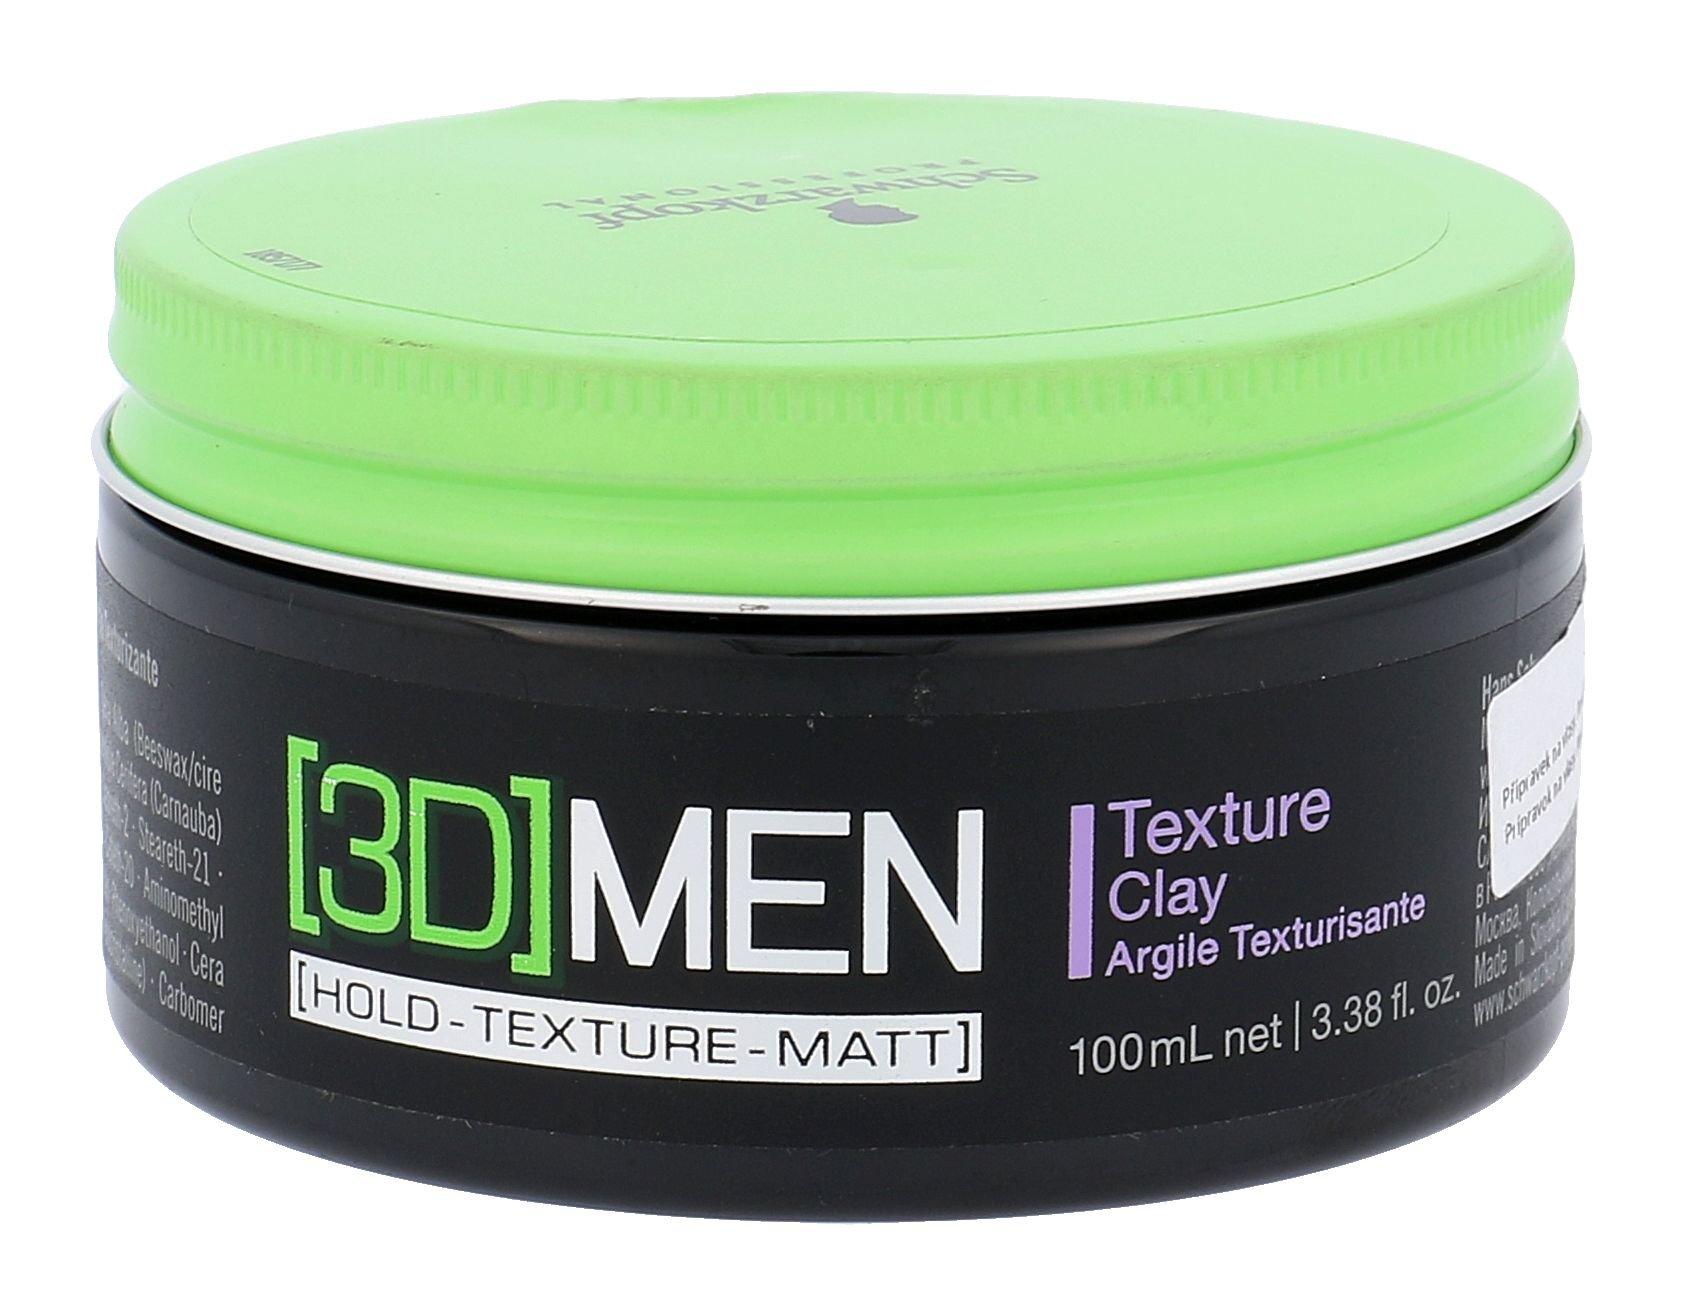 Schwarzkopf 3DMEN Cosmetic 100ml